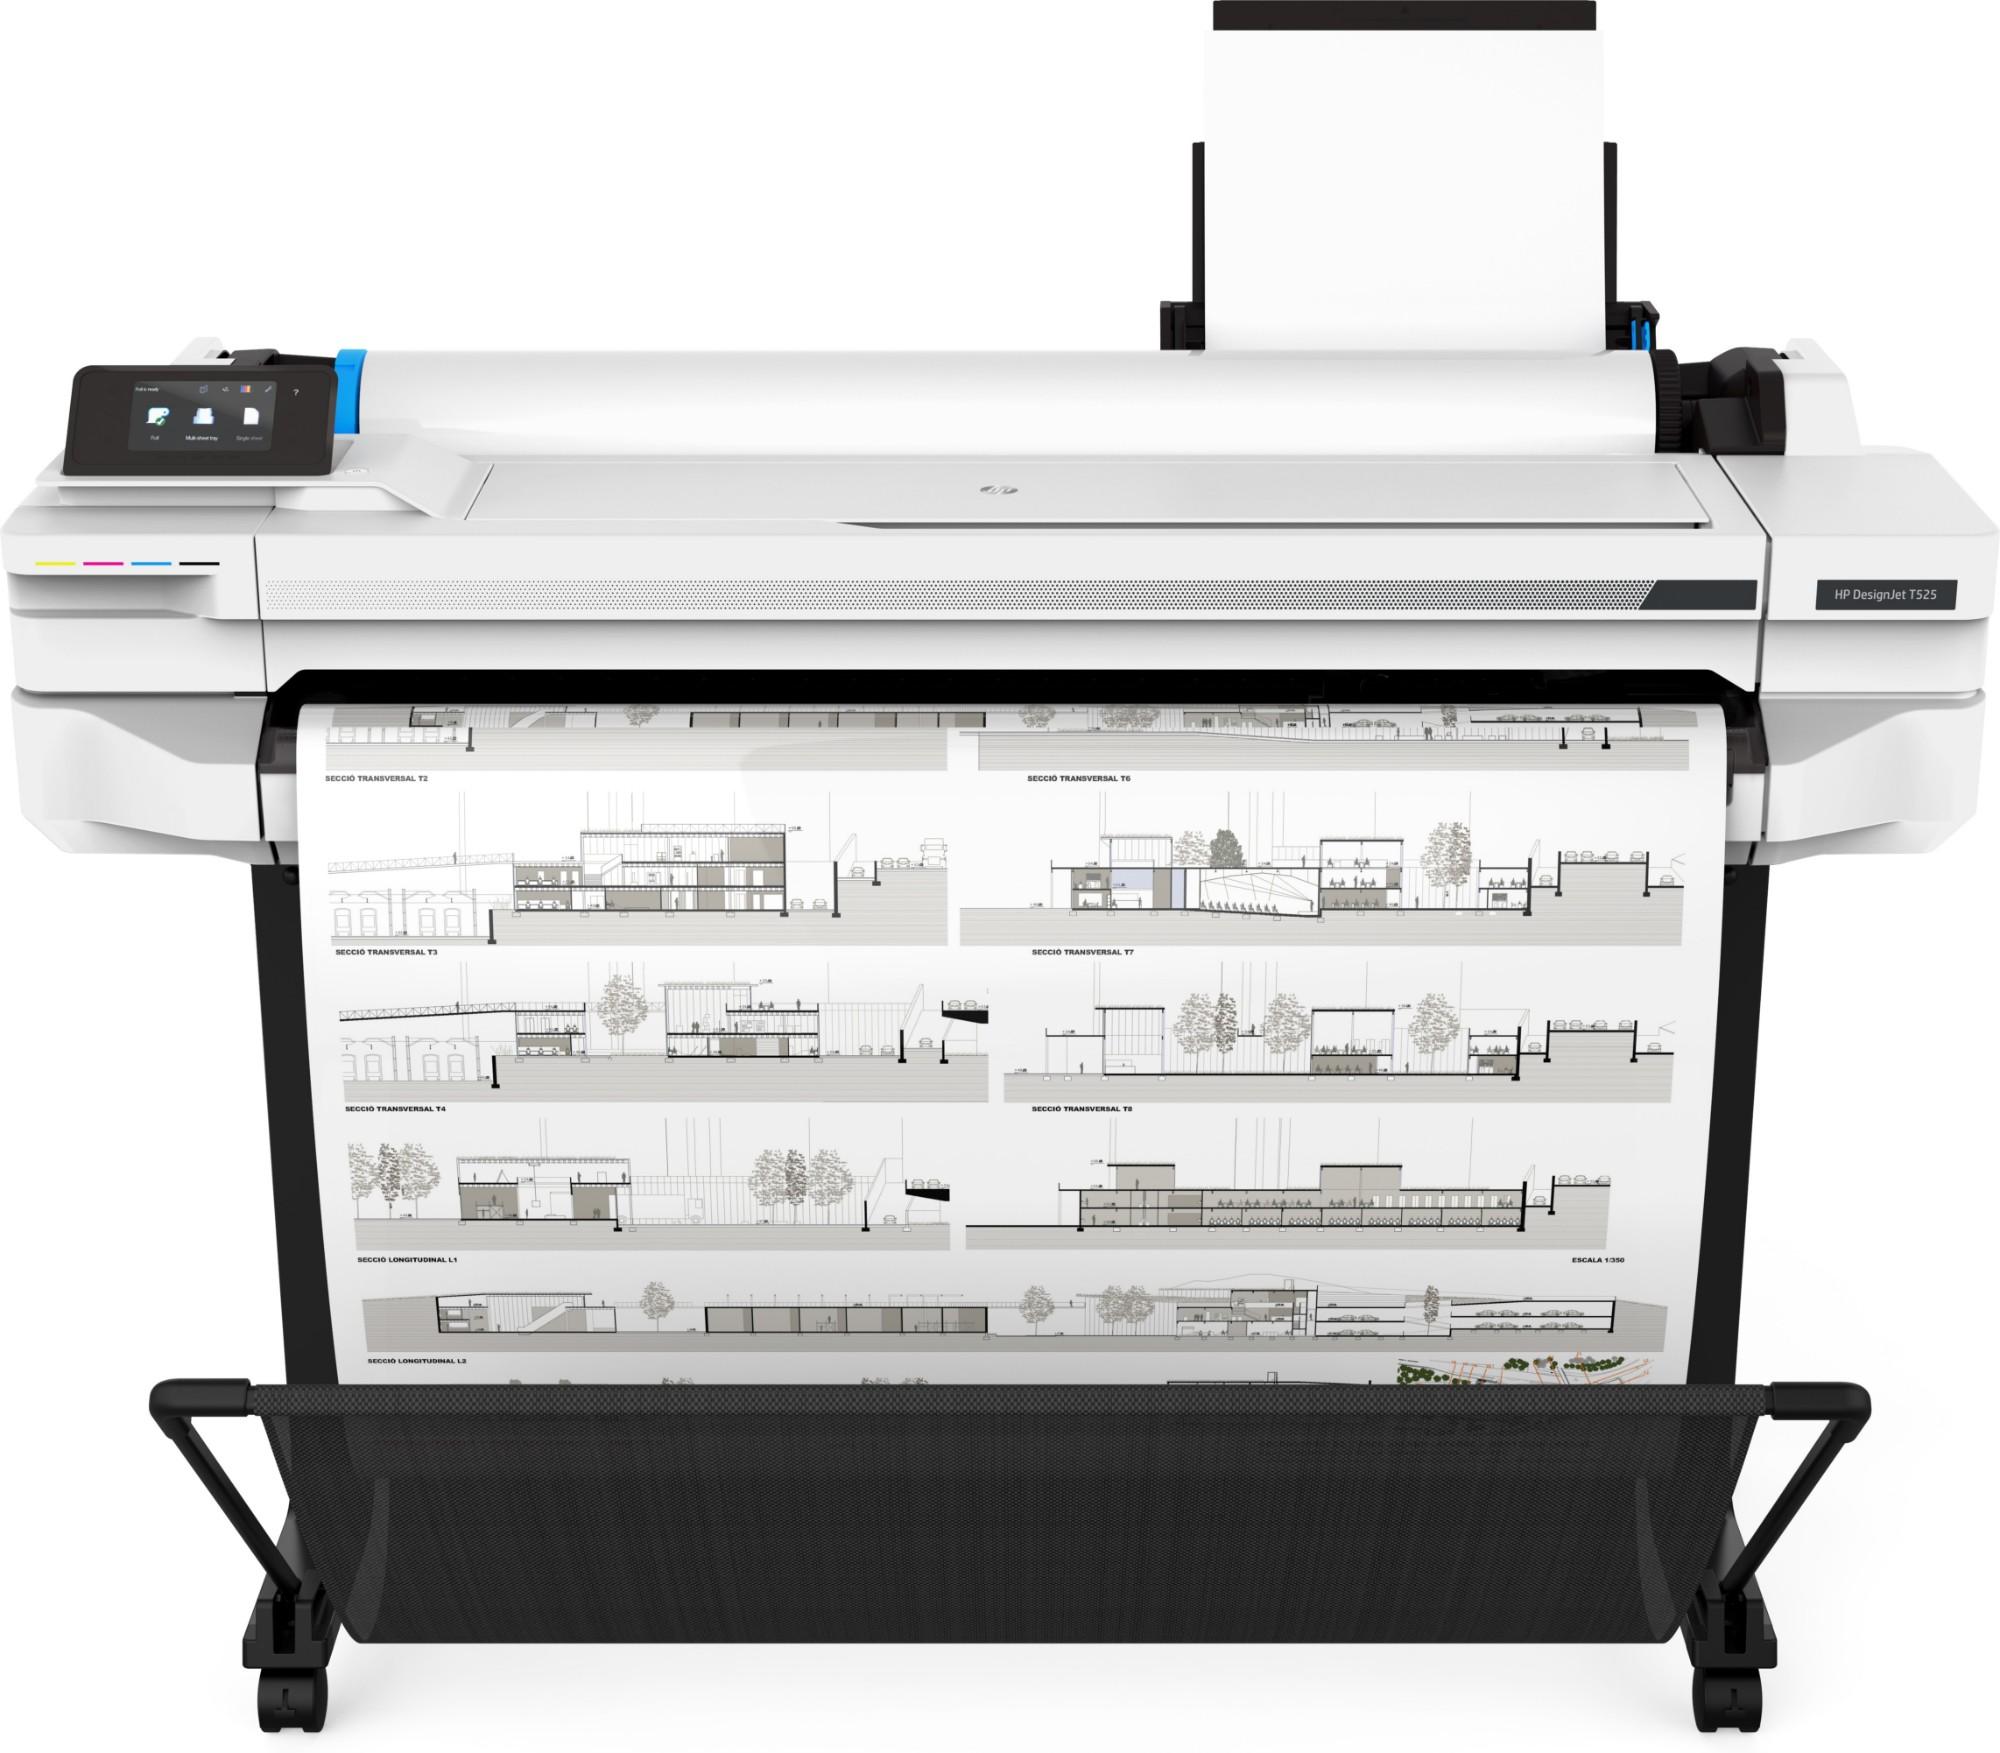 HP Designjet T525 large format printer Thermal inkjet Colour 2400 x 1200 DPI Ethernet LAN Wi-Fi